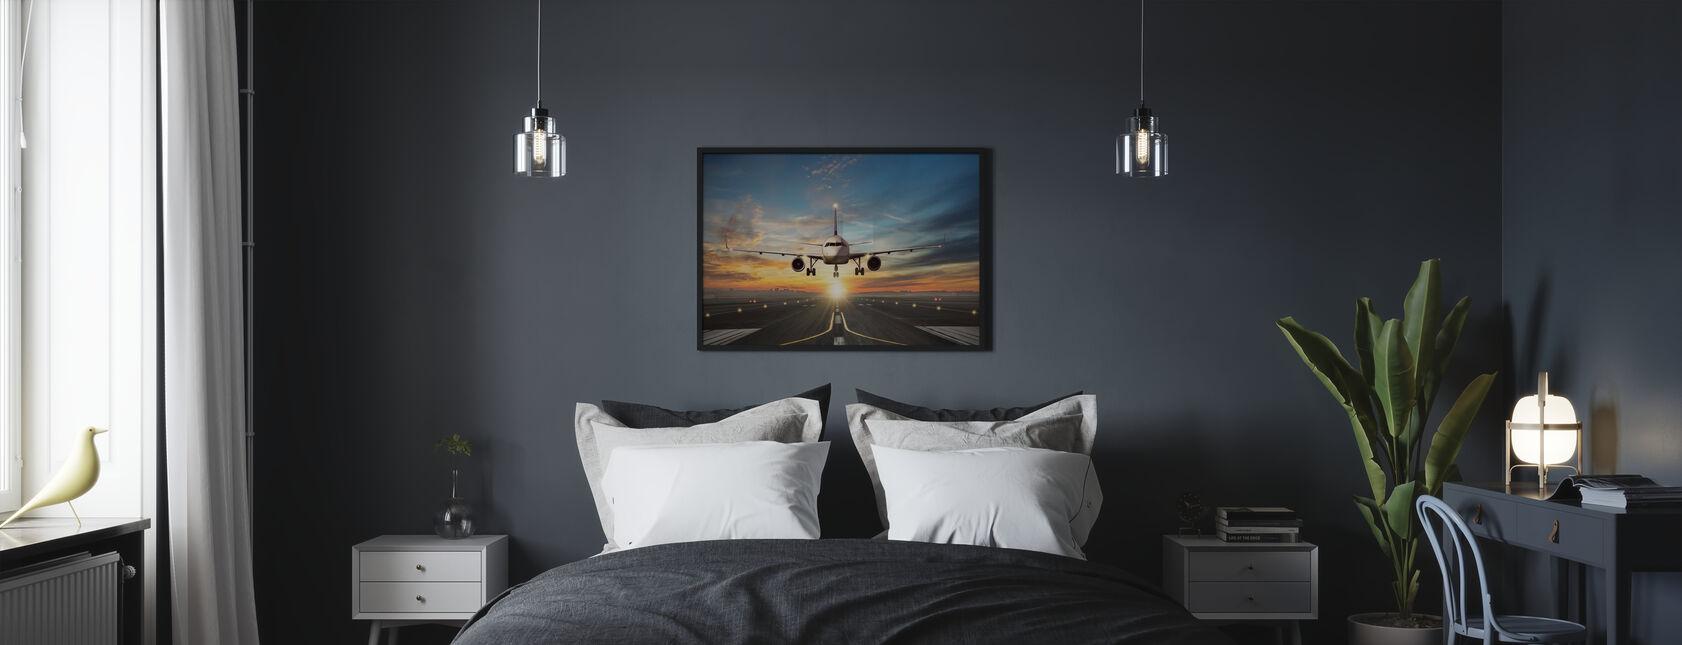 Zonsondergang aan boord - Poster - Slaapkamer